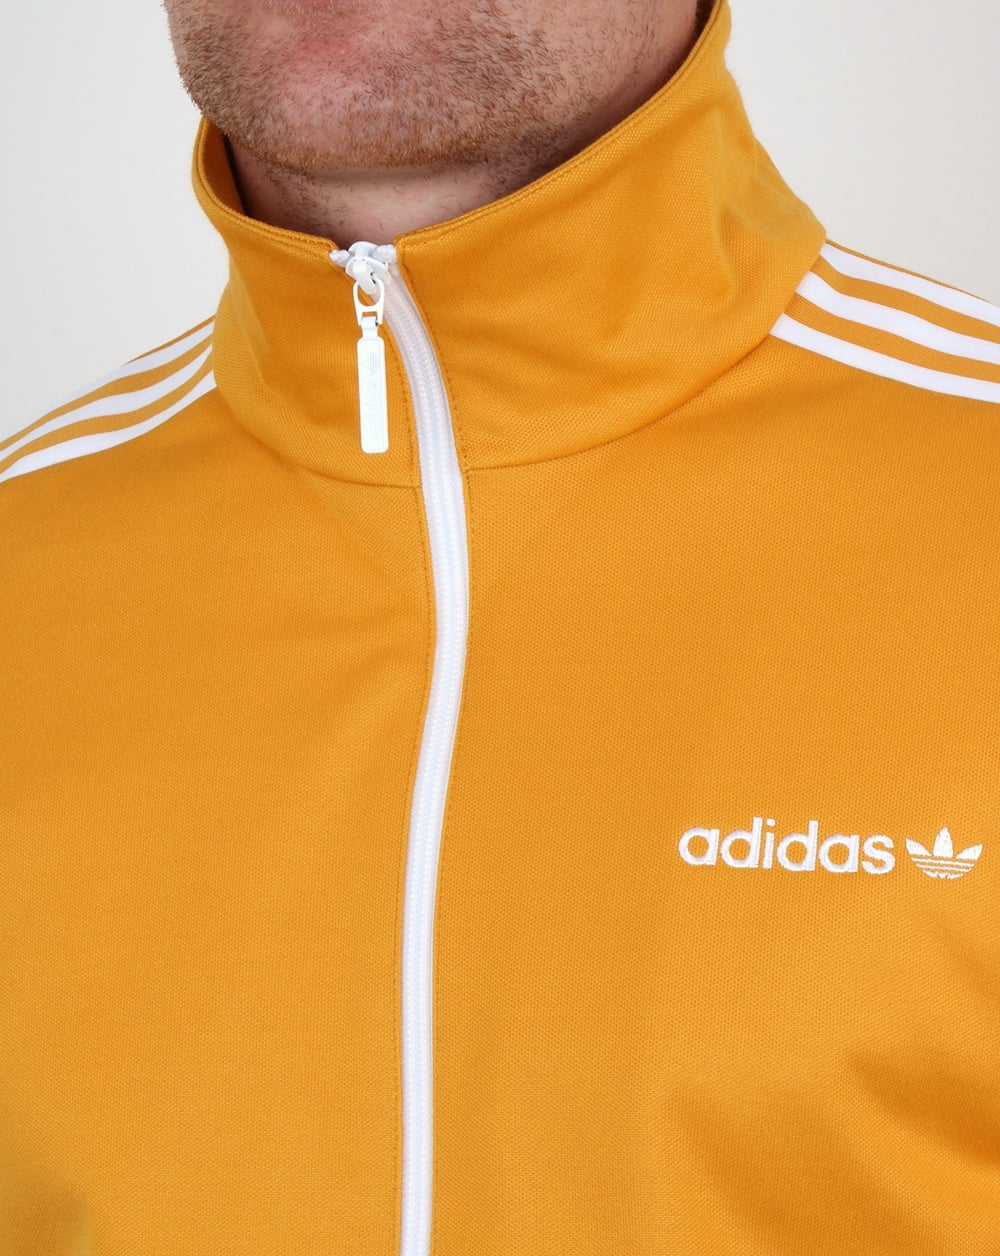 yellow adidas tracksuit